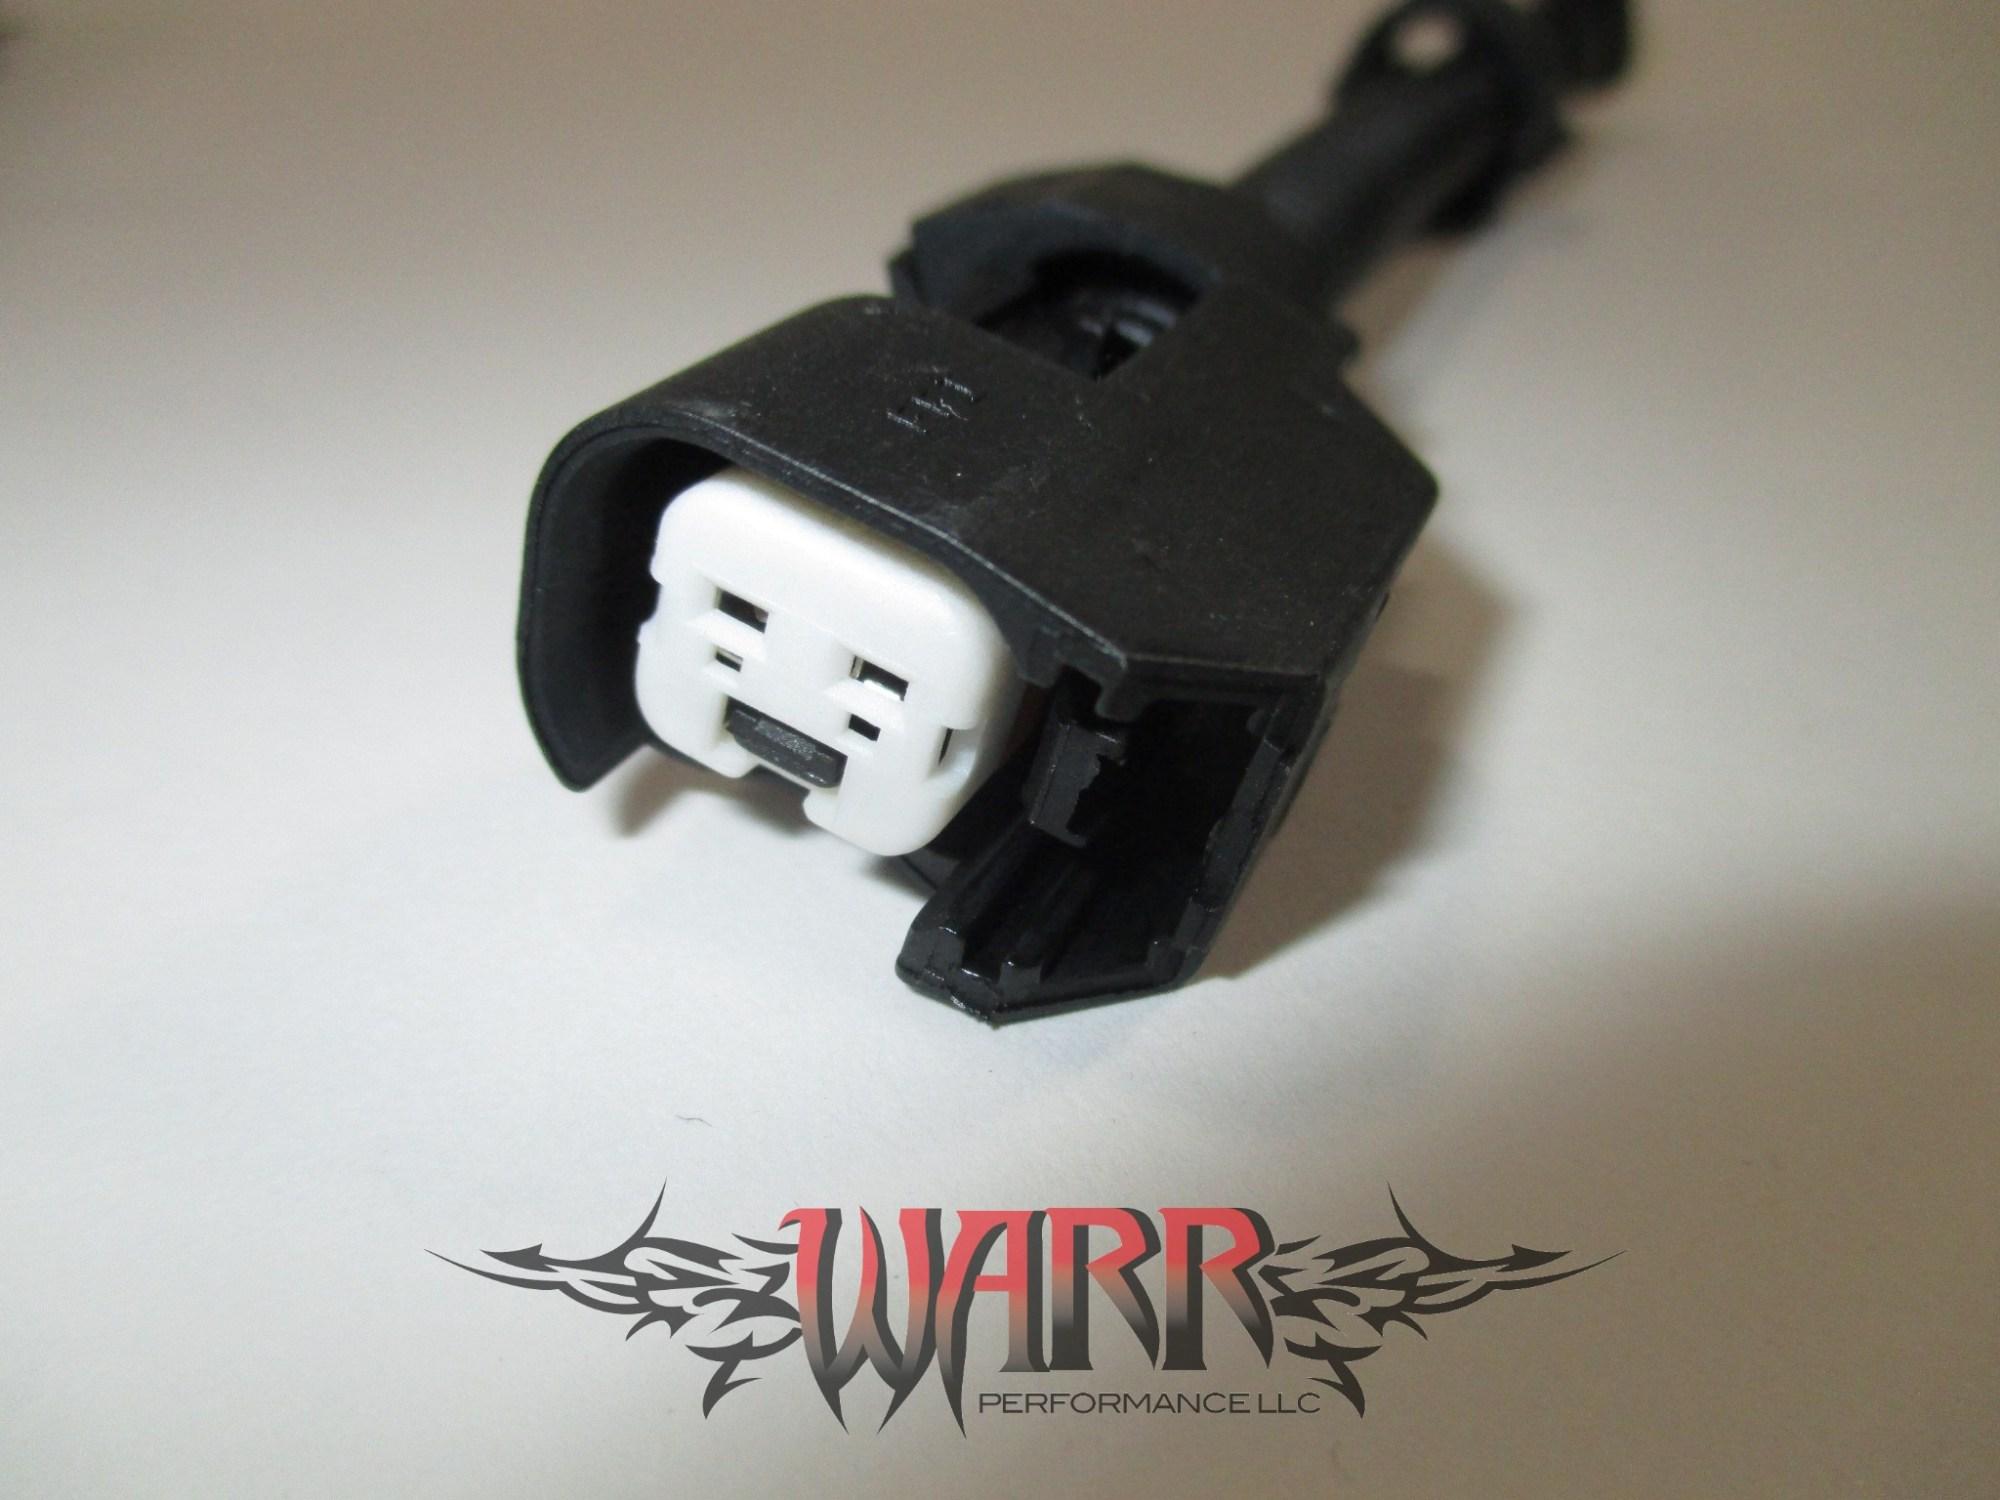 hight resolution of multec mini delphi wire harness to ls2 ls3 ls7 ev6 injector adapters